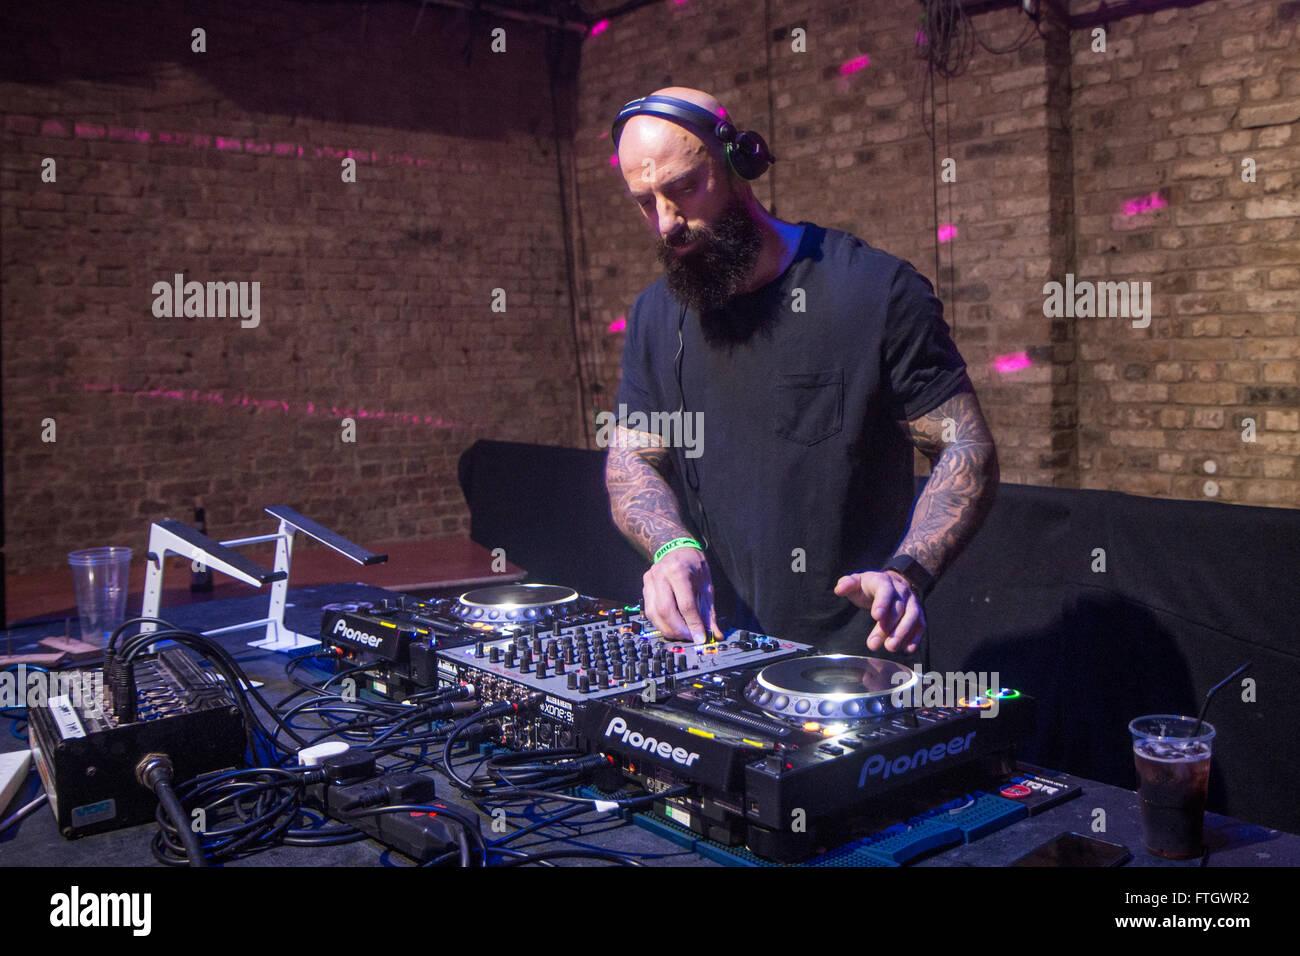 DJ Richard Harrington at the deck - Stock Image